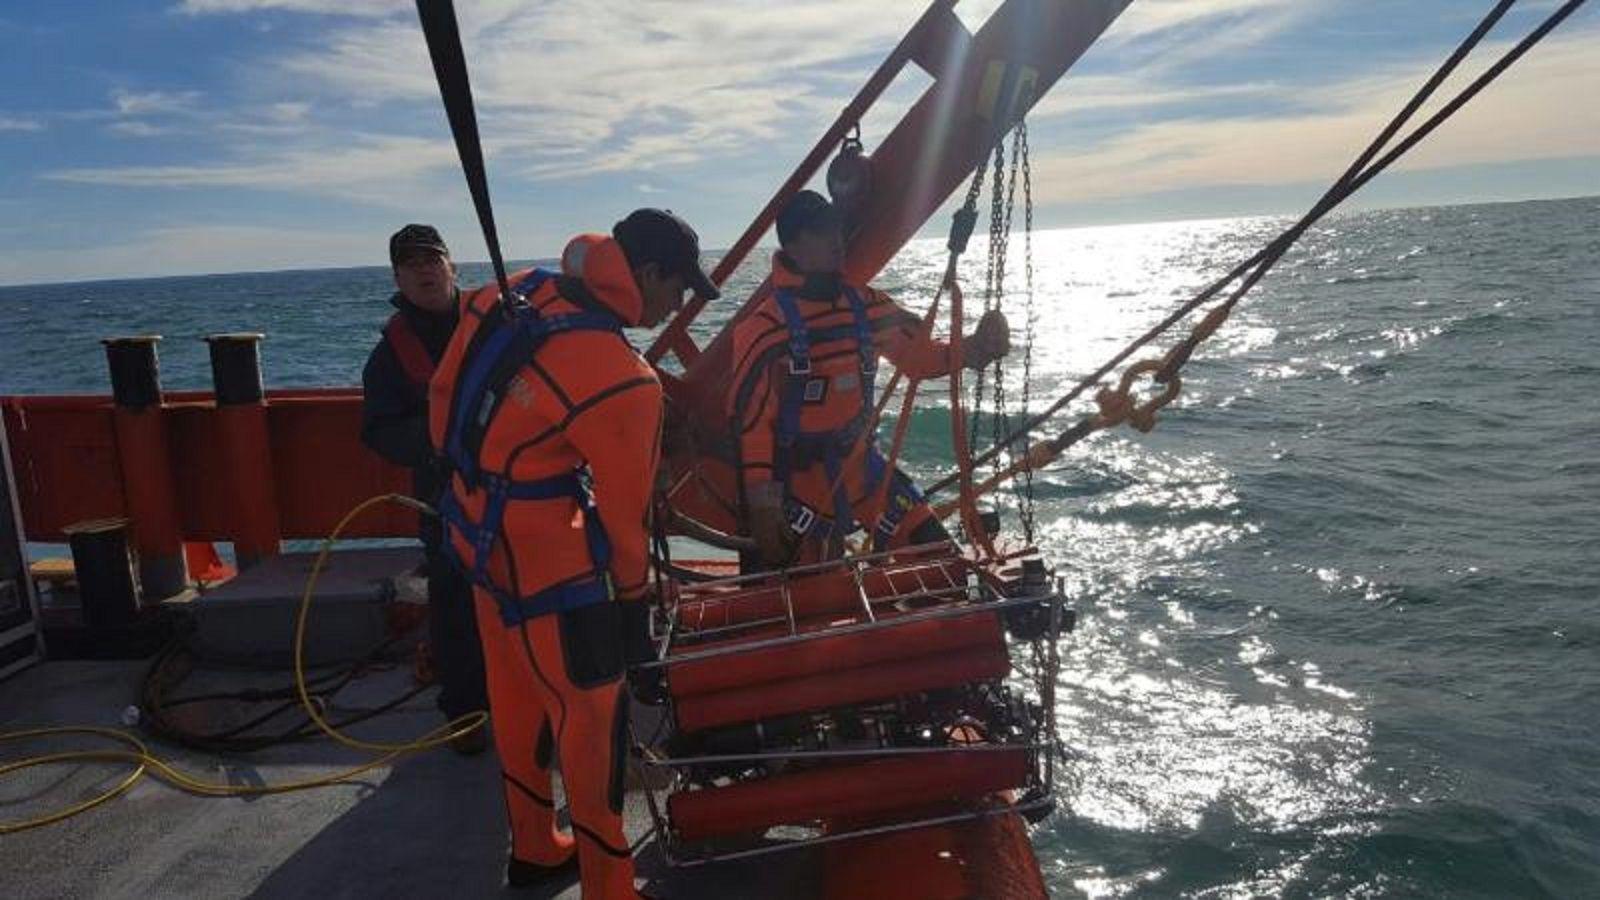 Prefectura encontró al buque pesquero Rigel en Chubut